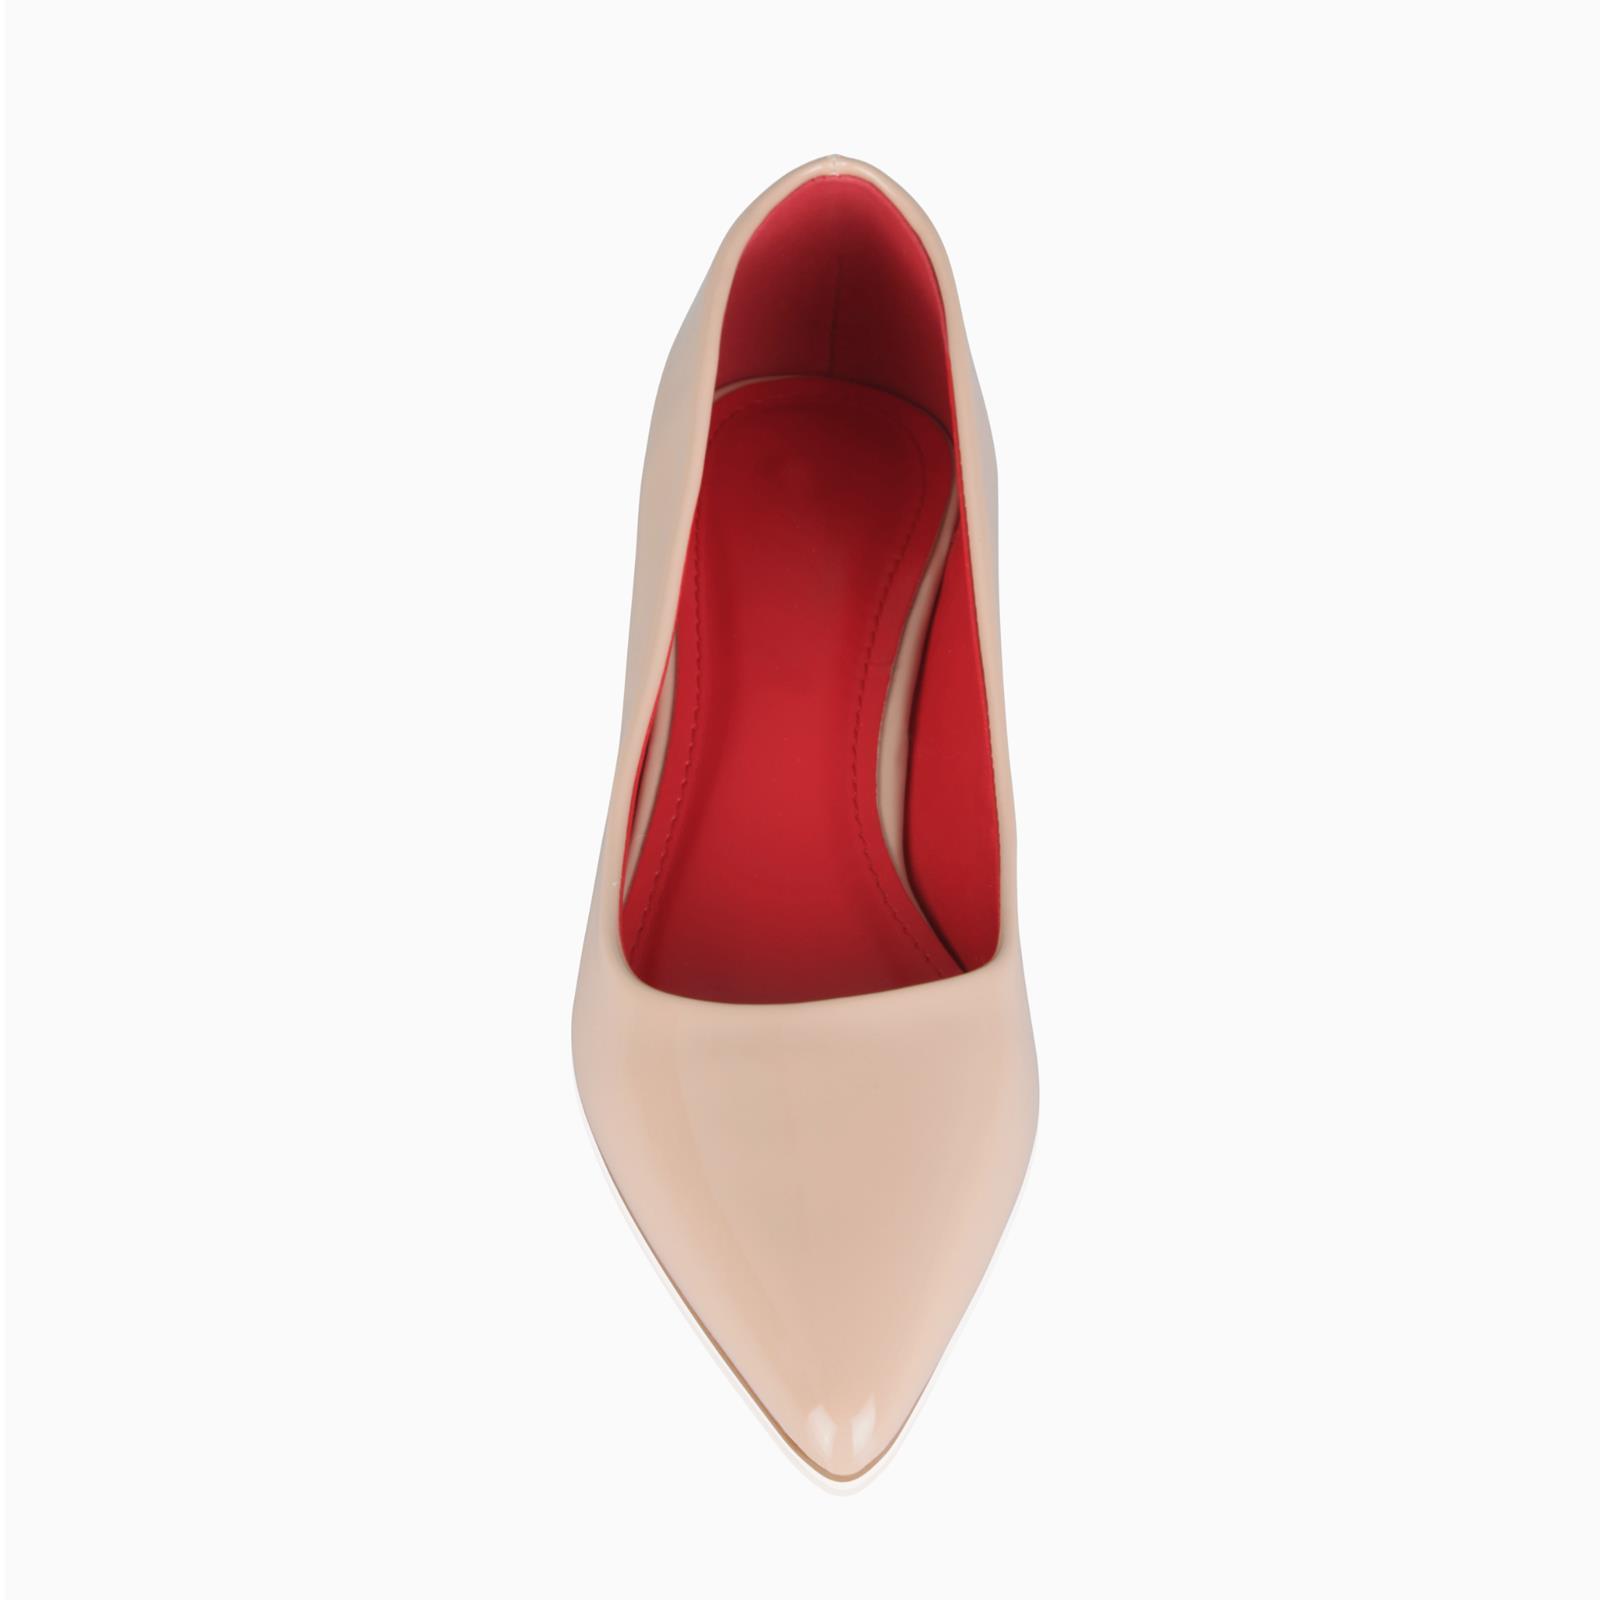 NJ Women Classic Low Block Heel Pumps Pointed Toe Patent Slip On Business Ladies Dress Shoes